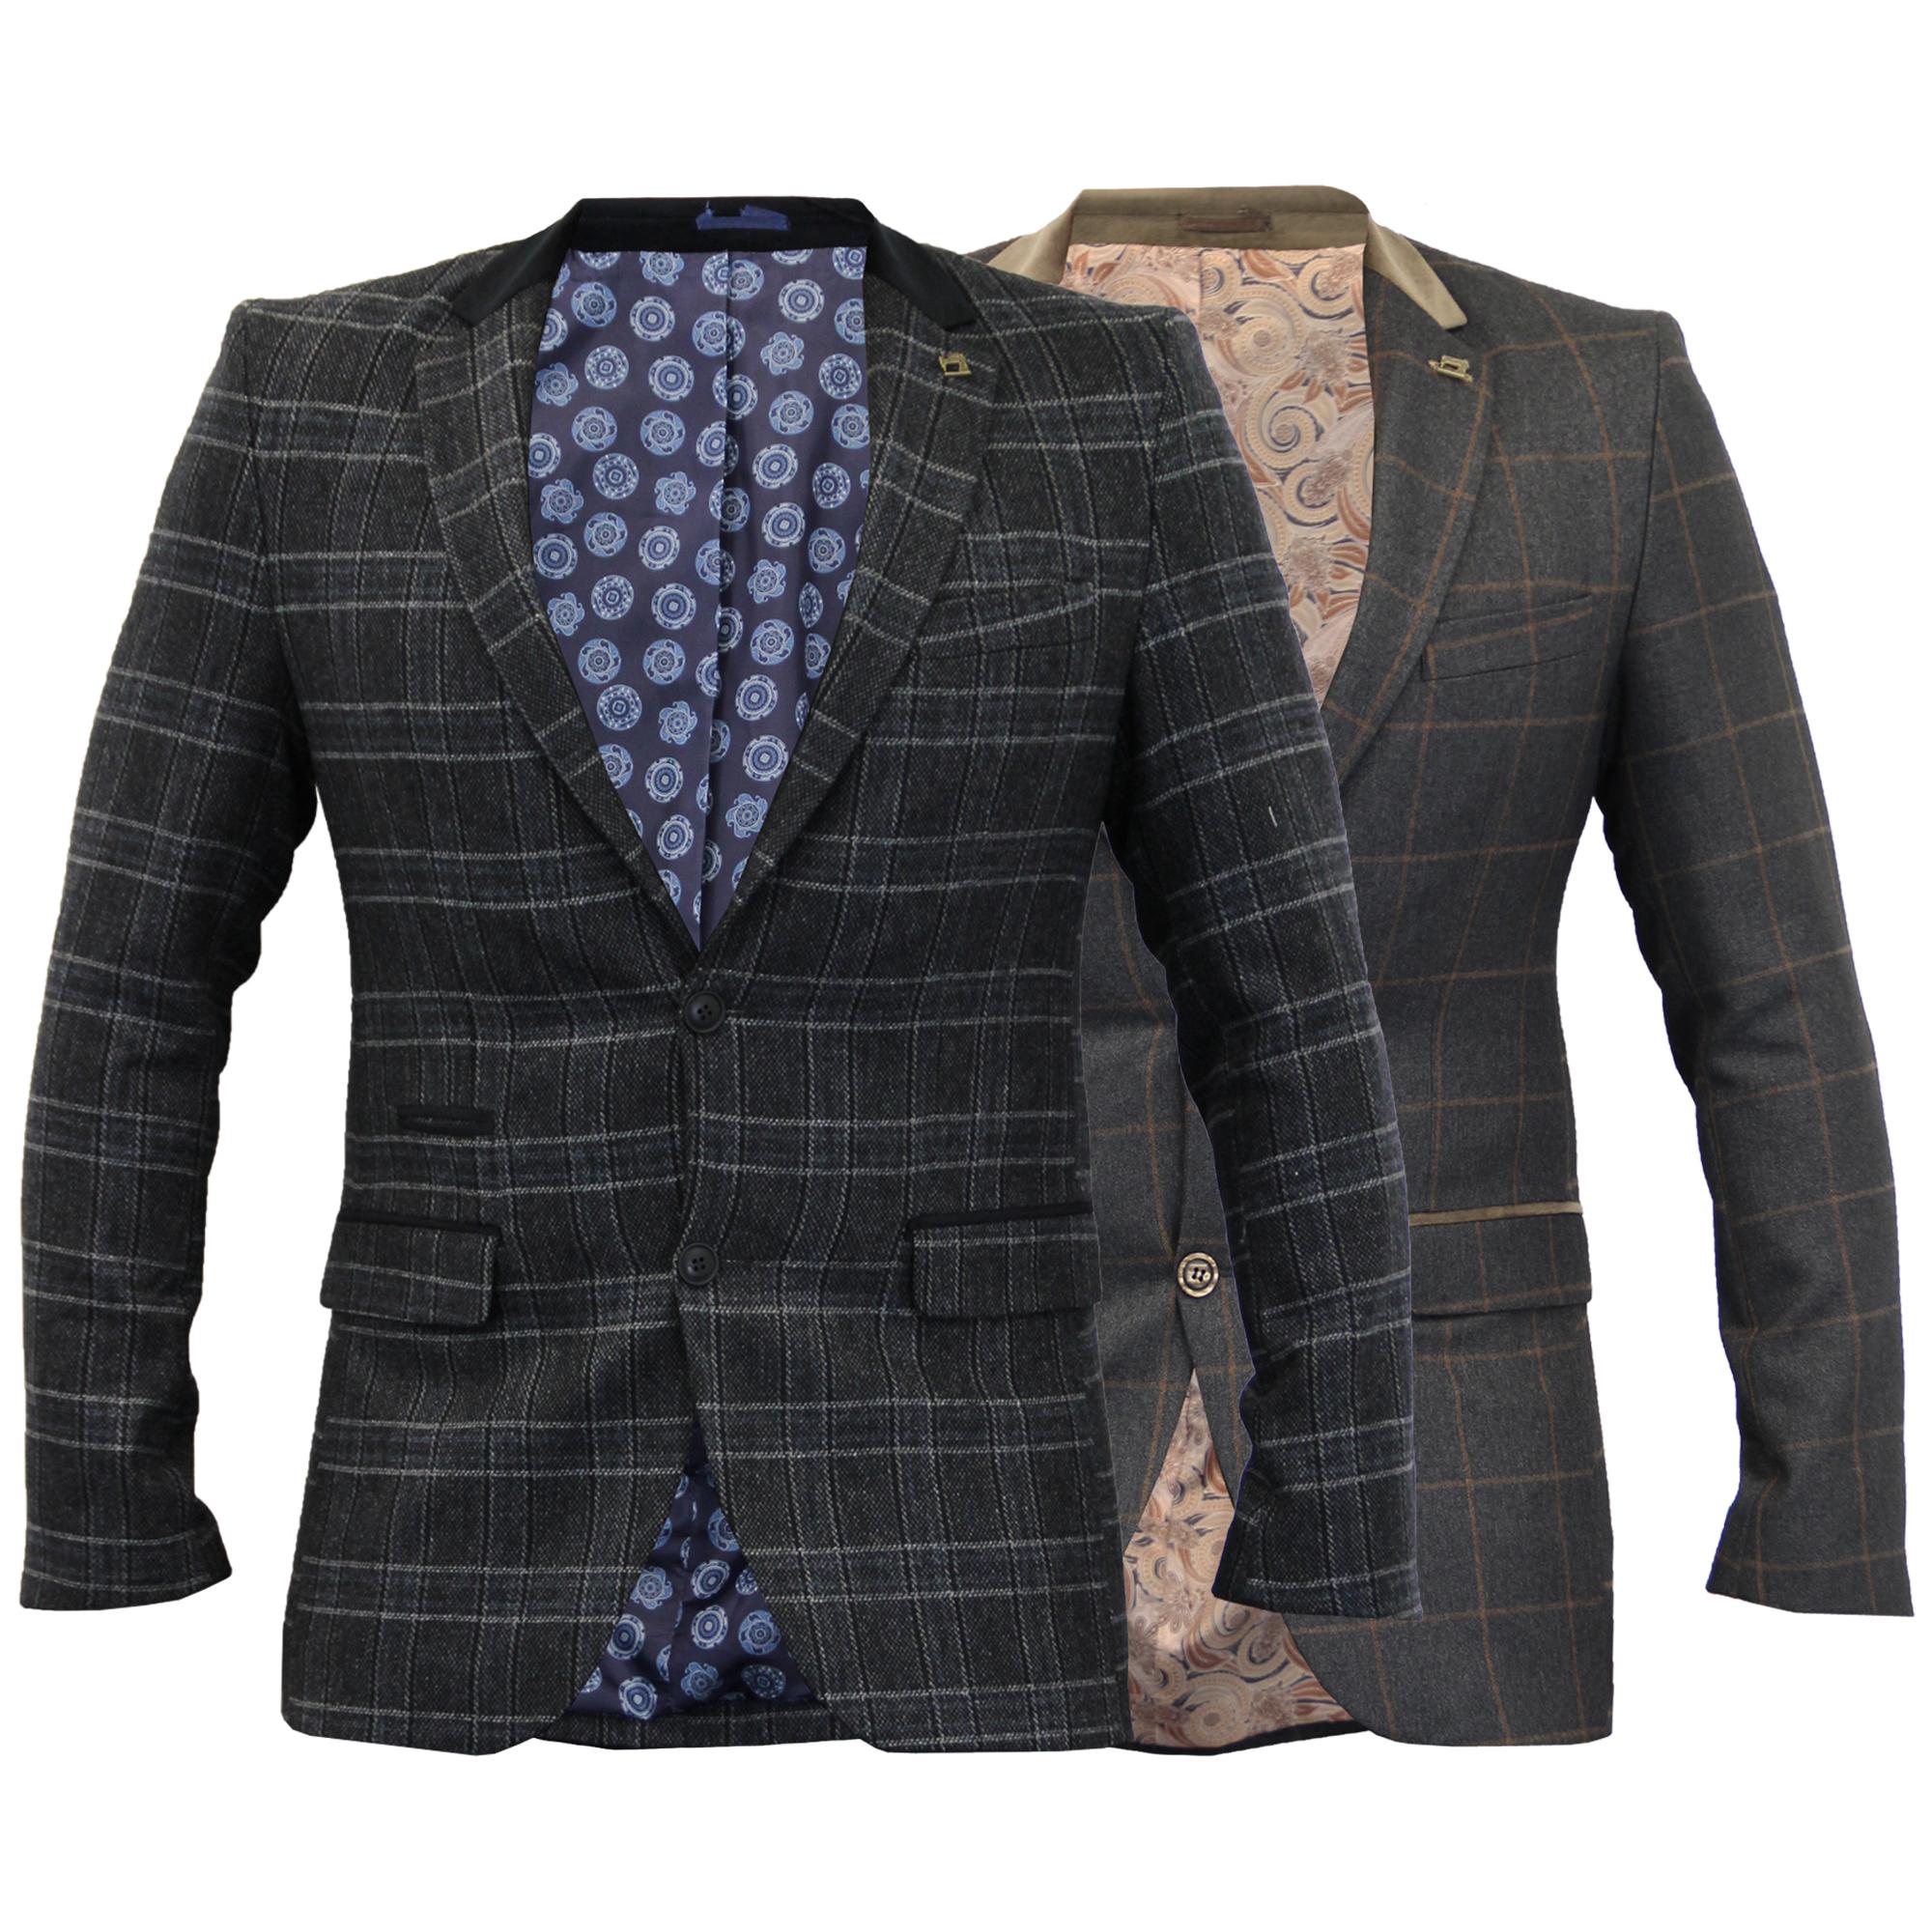 herren kariert blazer fischgr tenmuster tweed jacke mantel. Black Bedroom Furniture Sets. Home Design Ideas